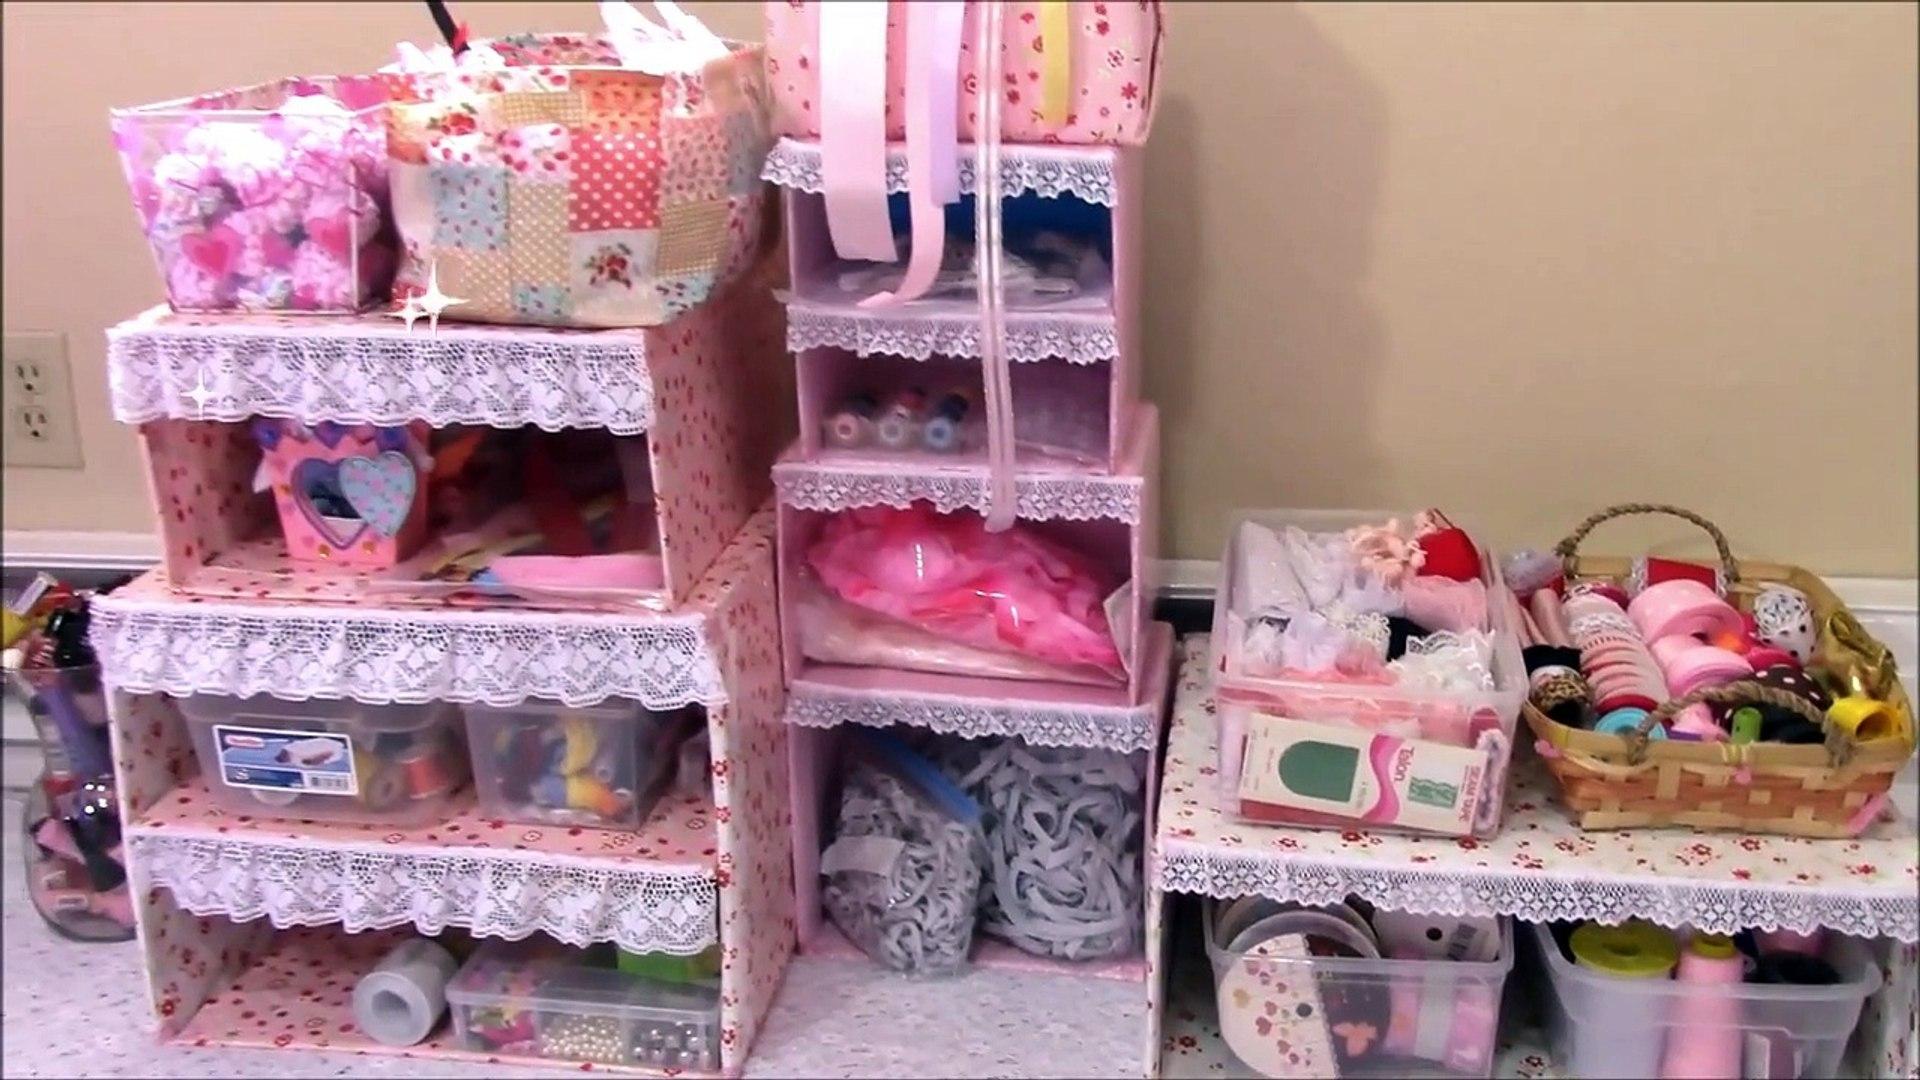 Diy Room Decor Make Your Own Princess Shelves Easy Video Dailymotion